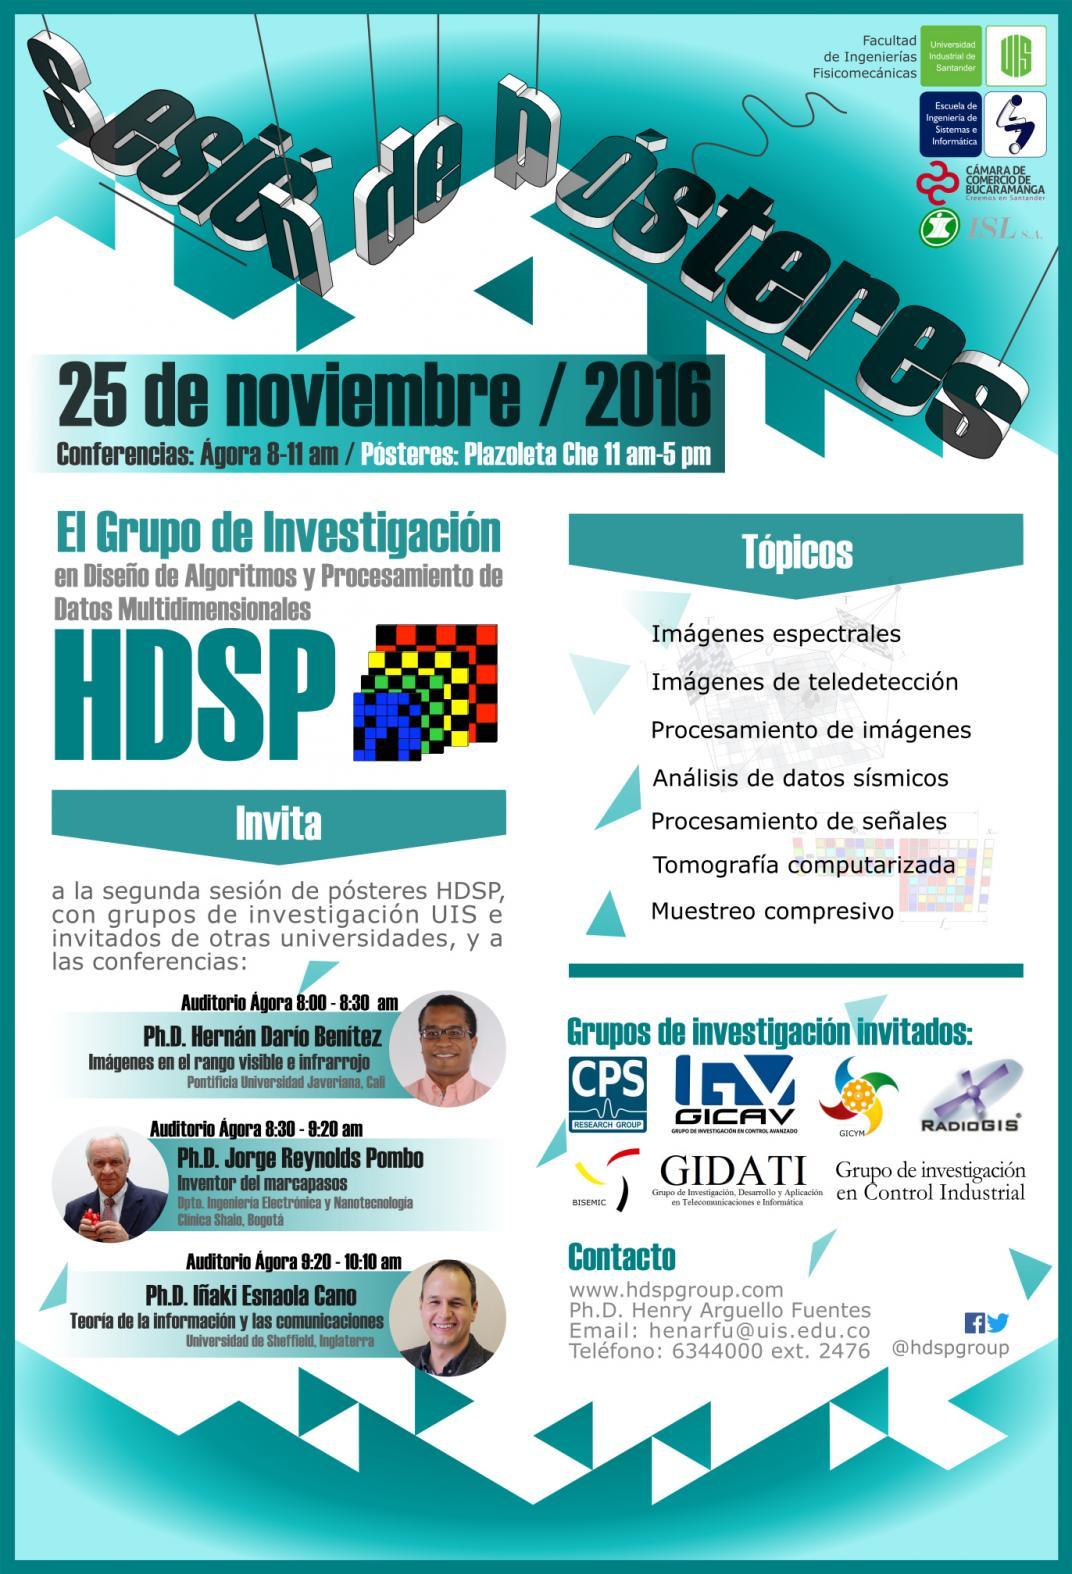 Agenda -II Sesión de Pósteres HDSP 2016, Grupos UIS - Charlas Científicas